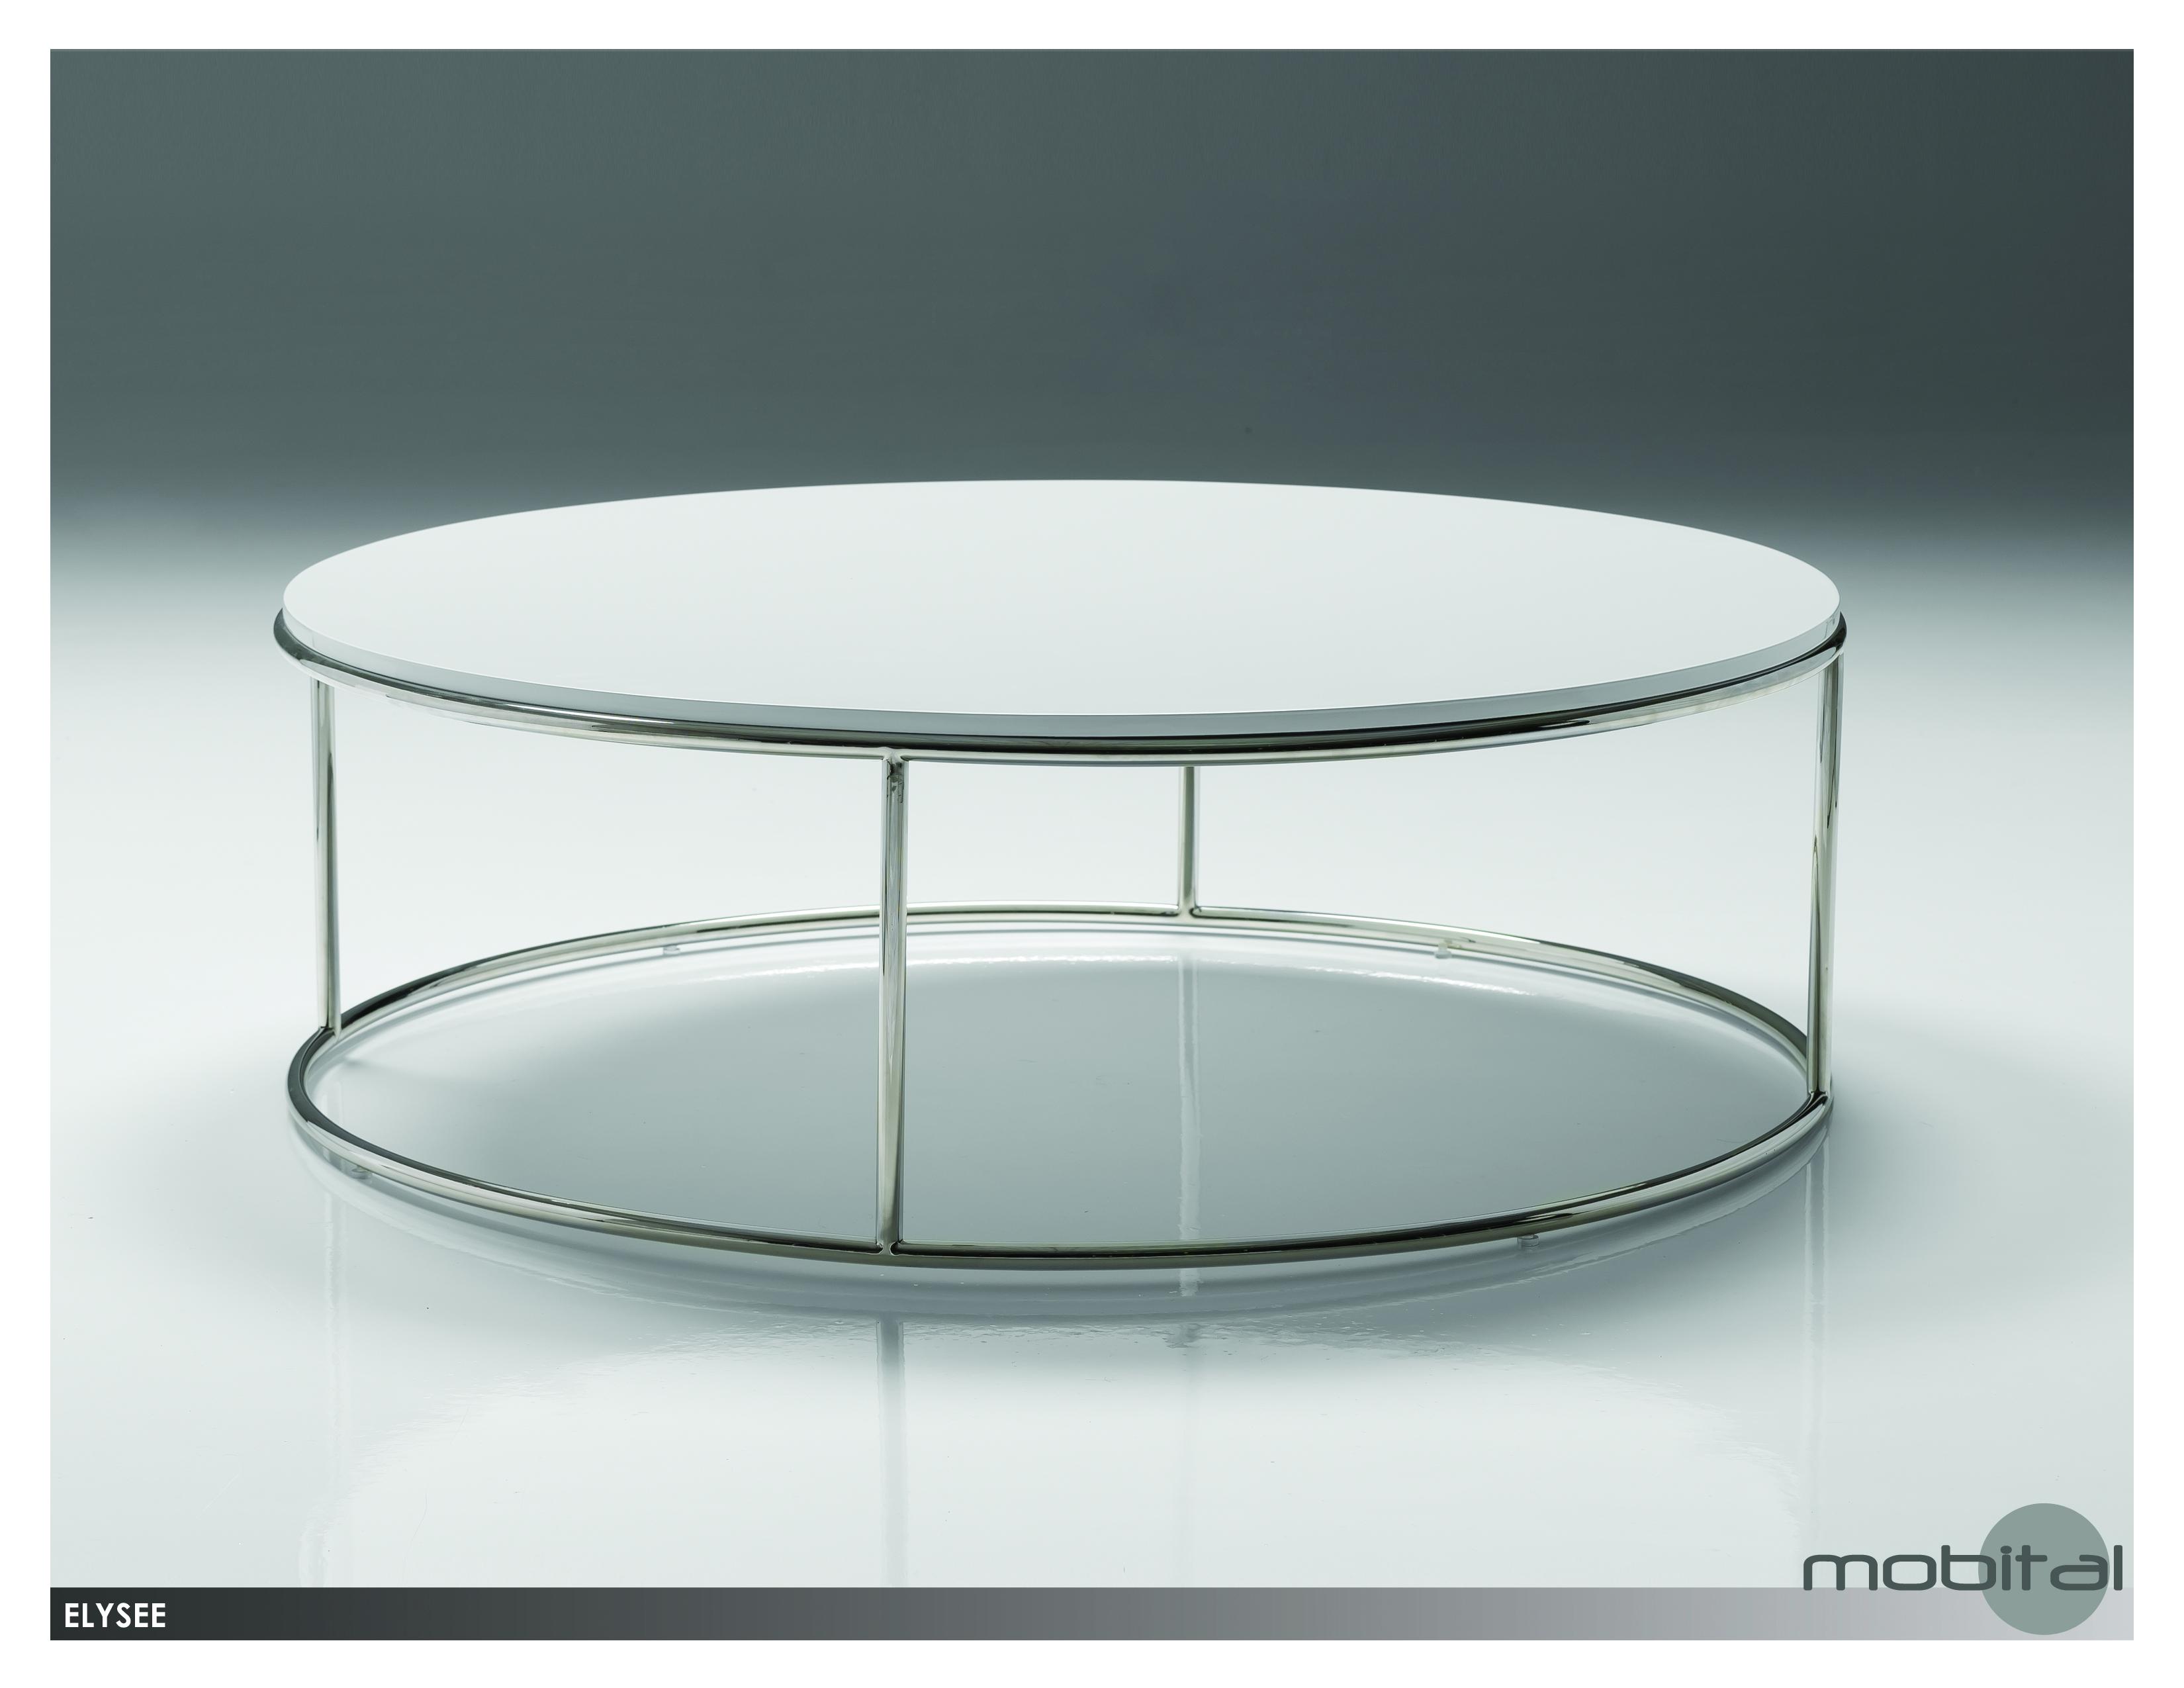 06 elysee round coffee table copy